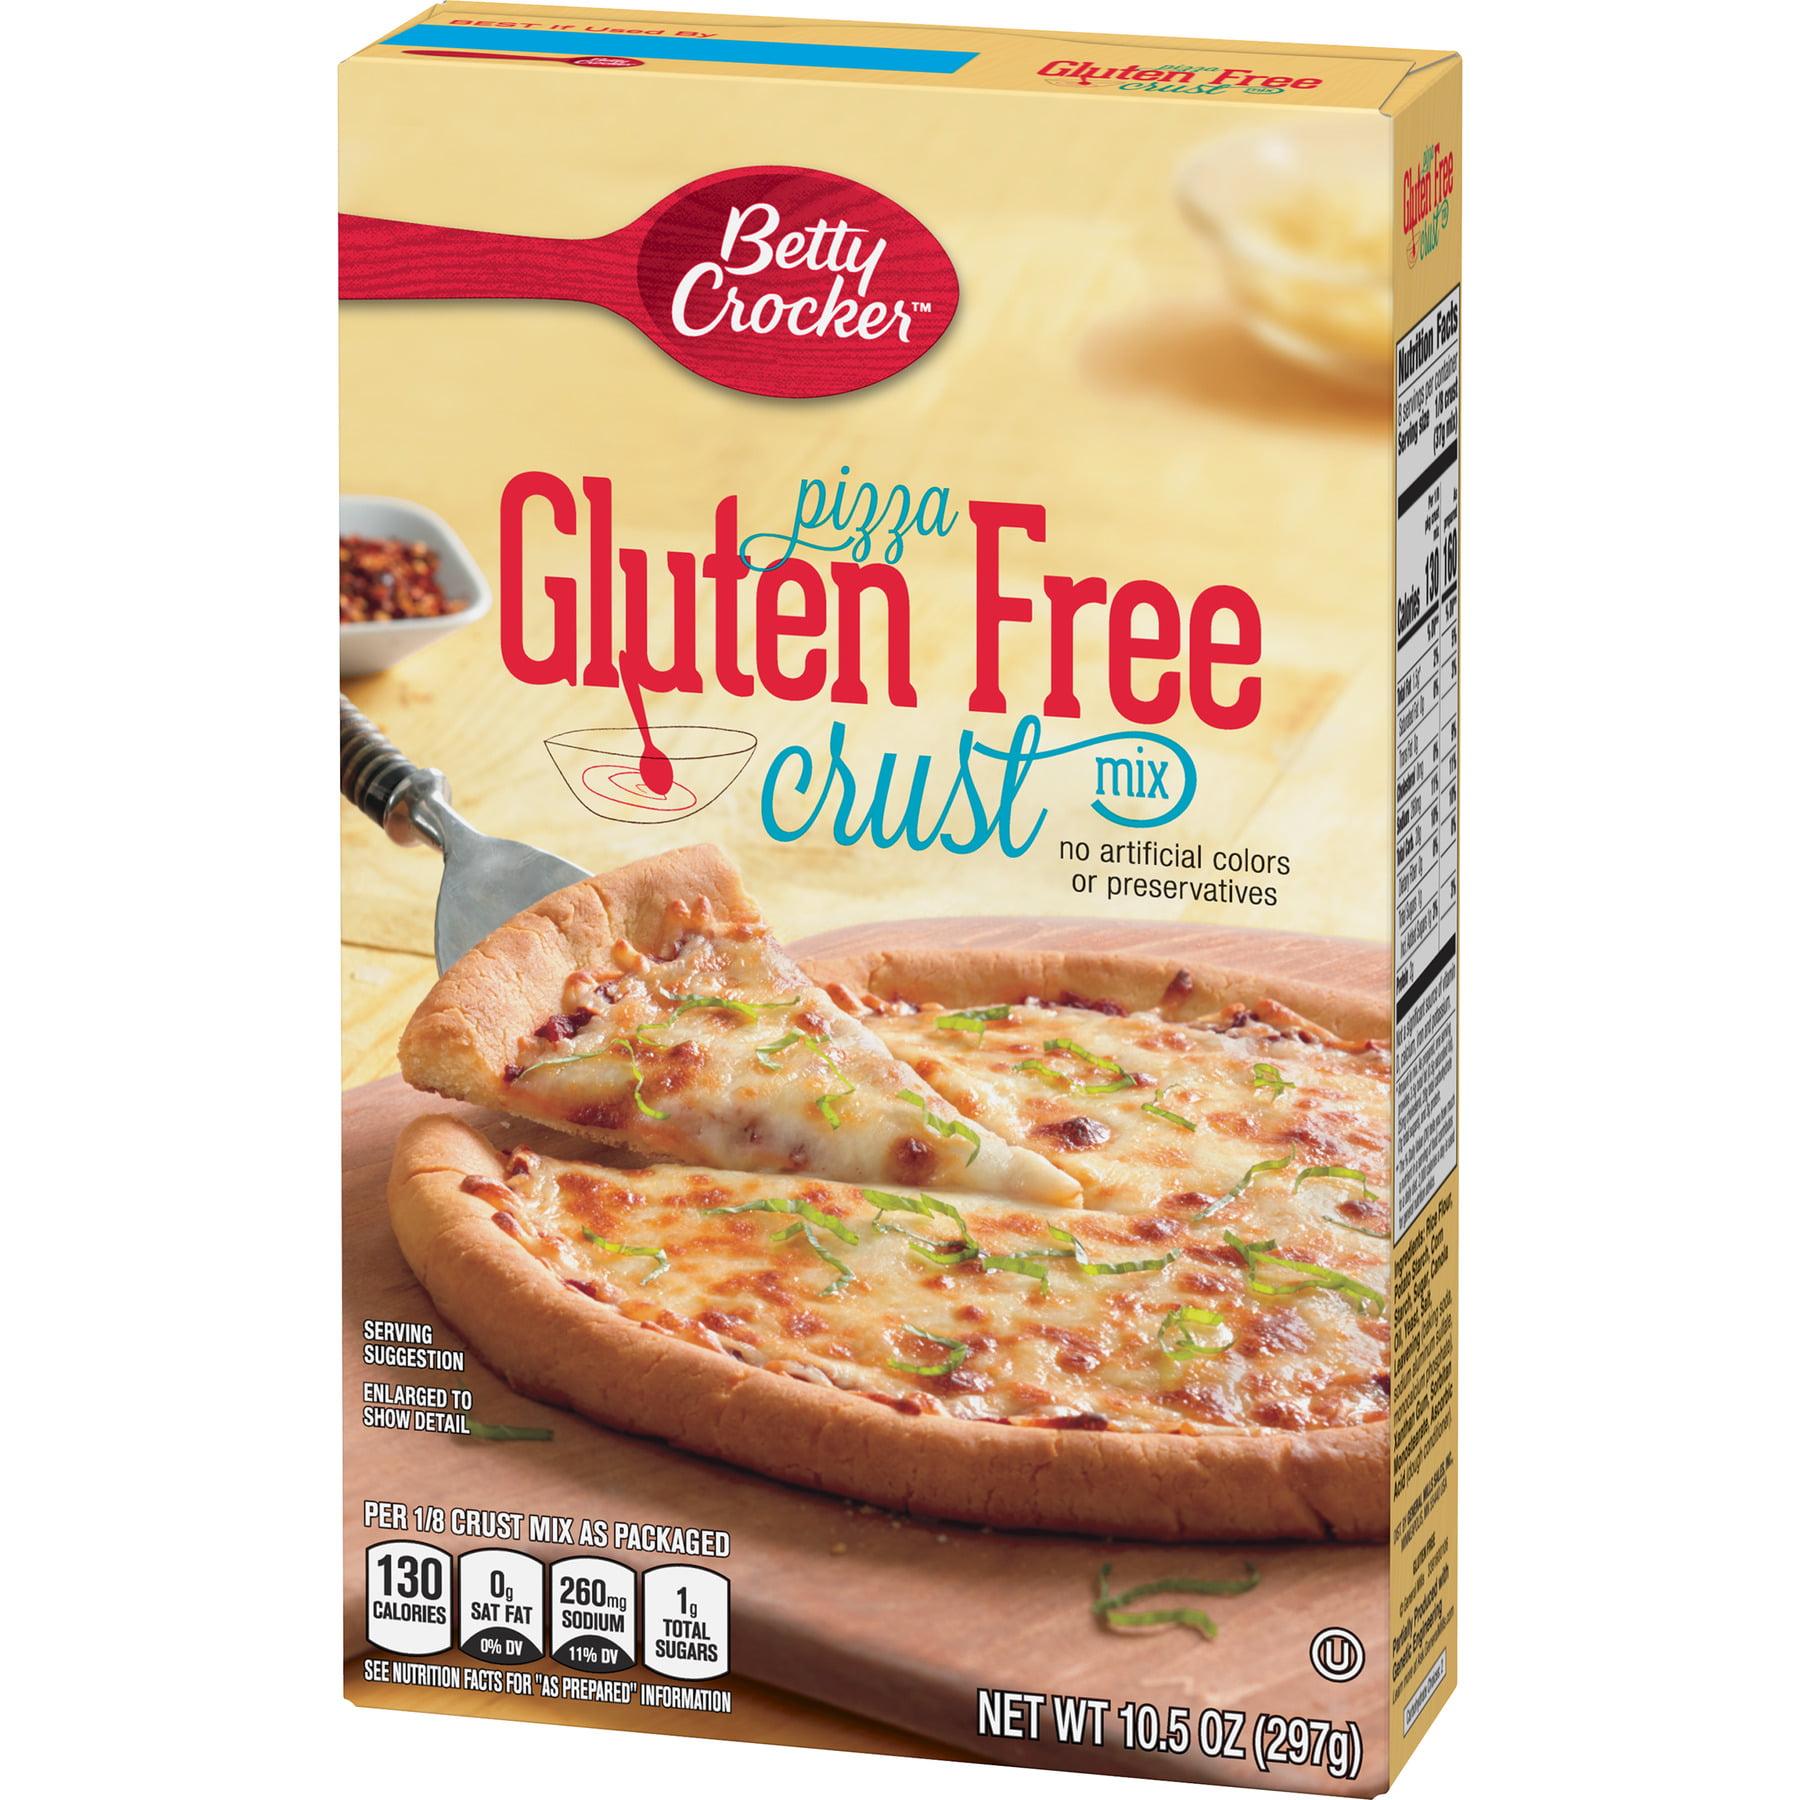 Betty Crocker Gluten Free Pizza Crust Mix 10 5 Oz Walmart Com